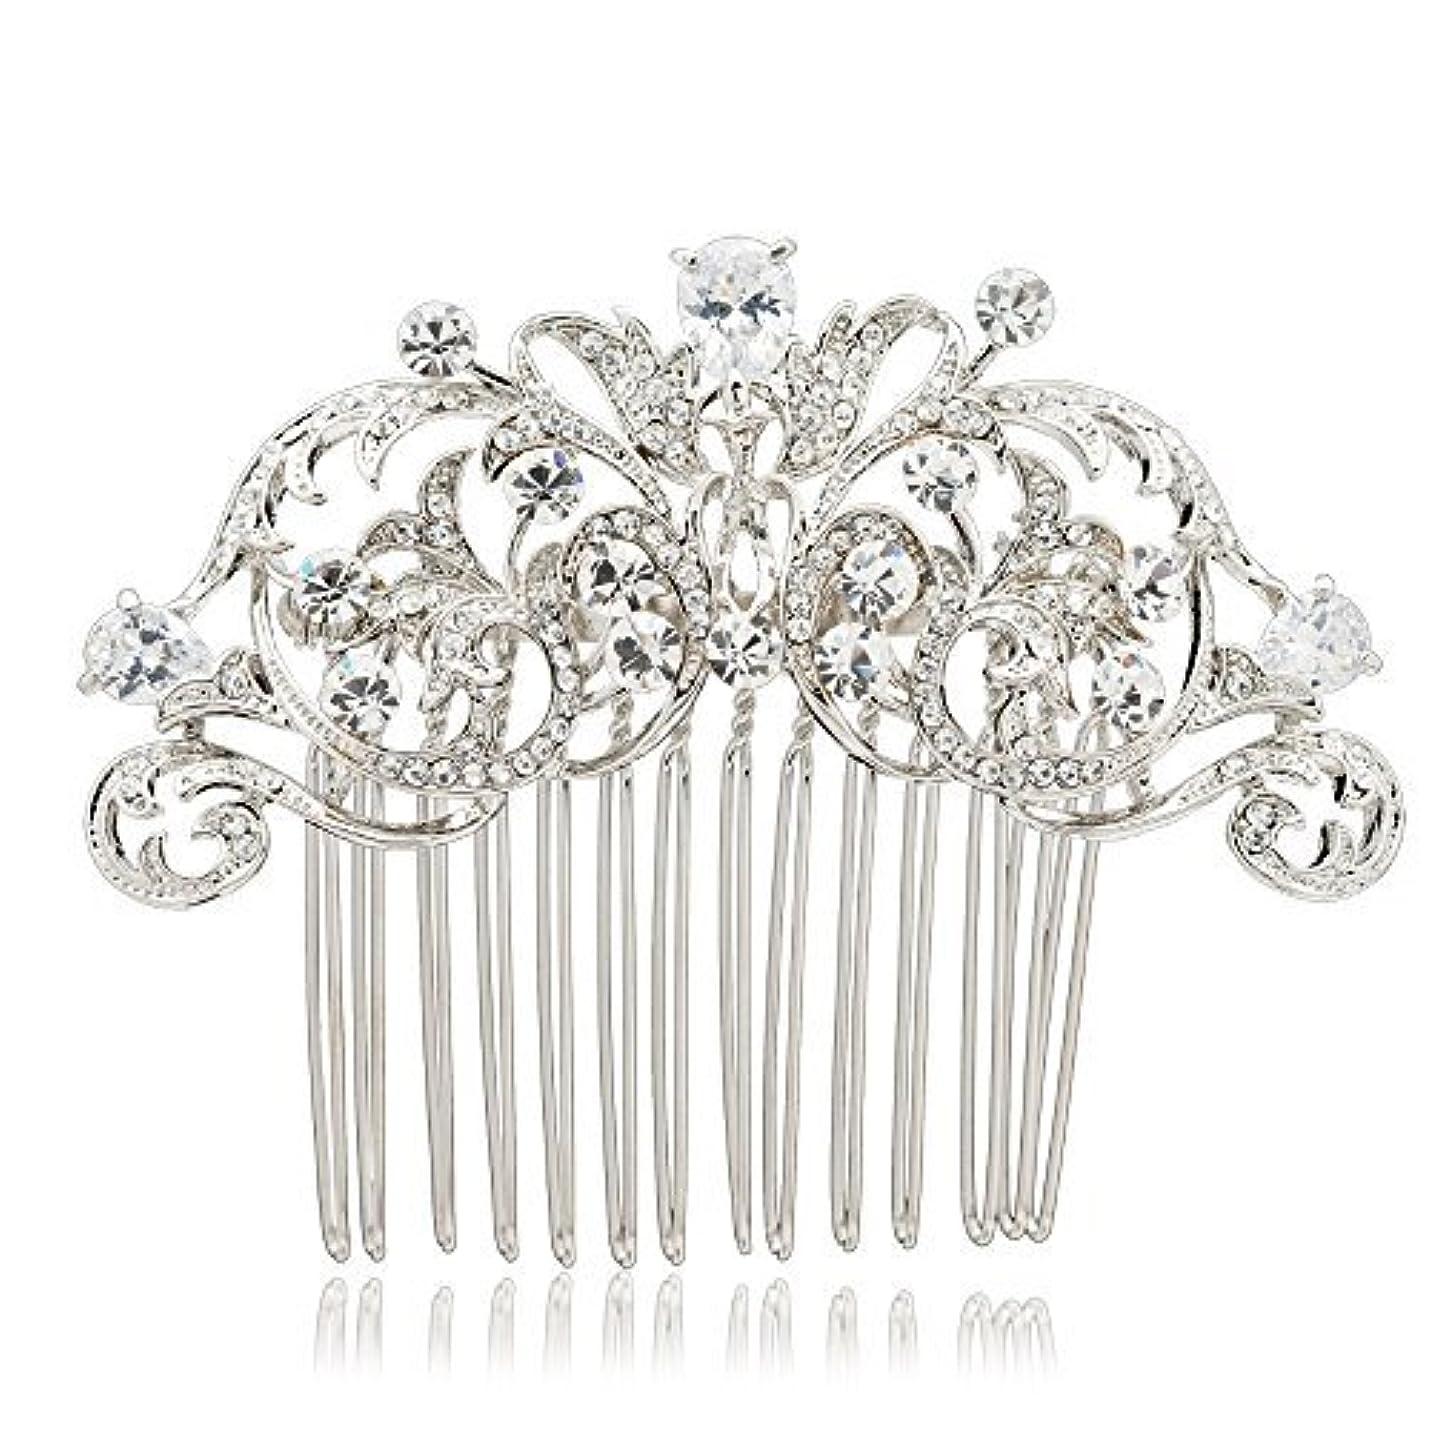 支給運搬着服SEPBRIDALS Crystal Rhinestone Hair Side Comb Pins Bridal Wedding Women Hair Accessories Jewelry 2253R [並行輸入品]